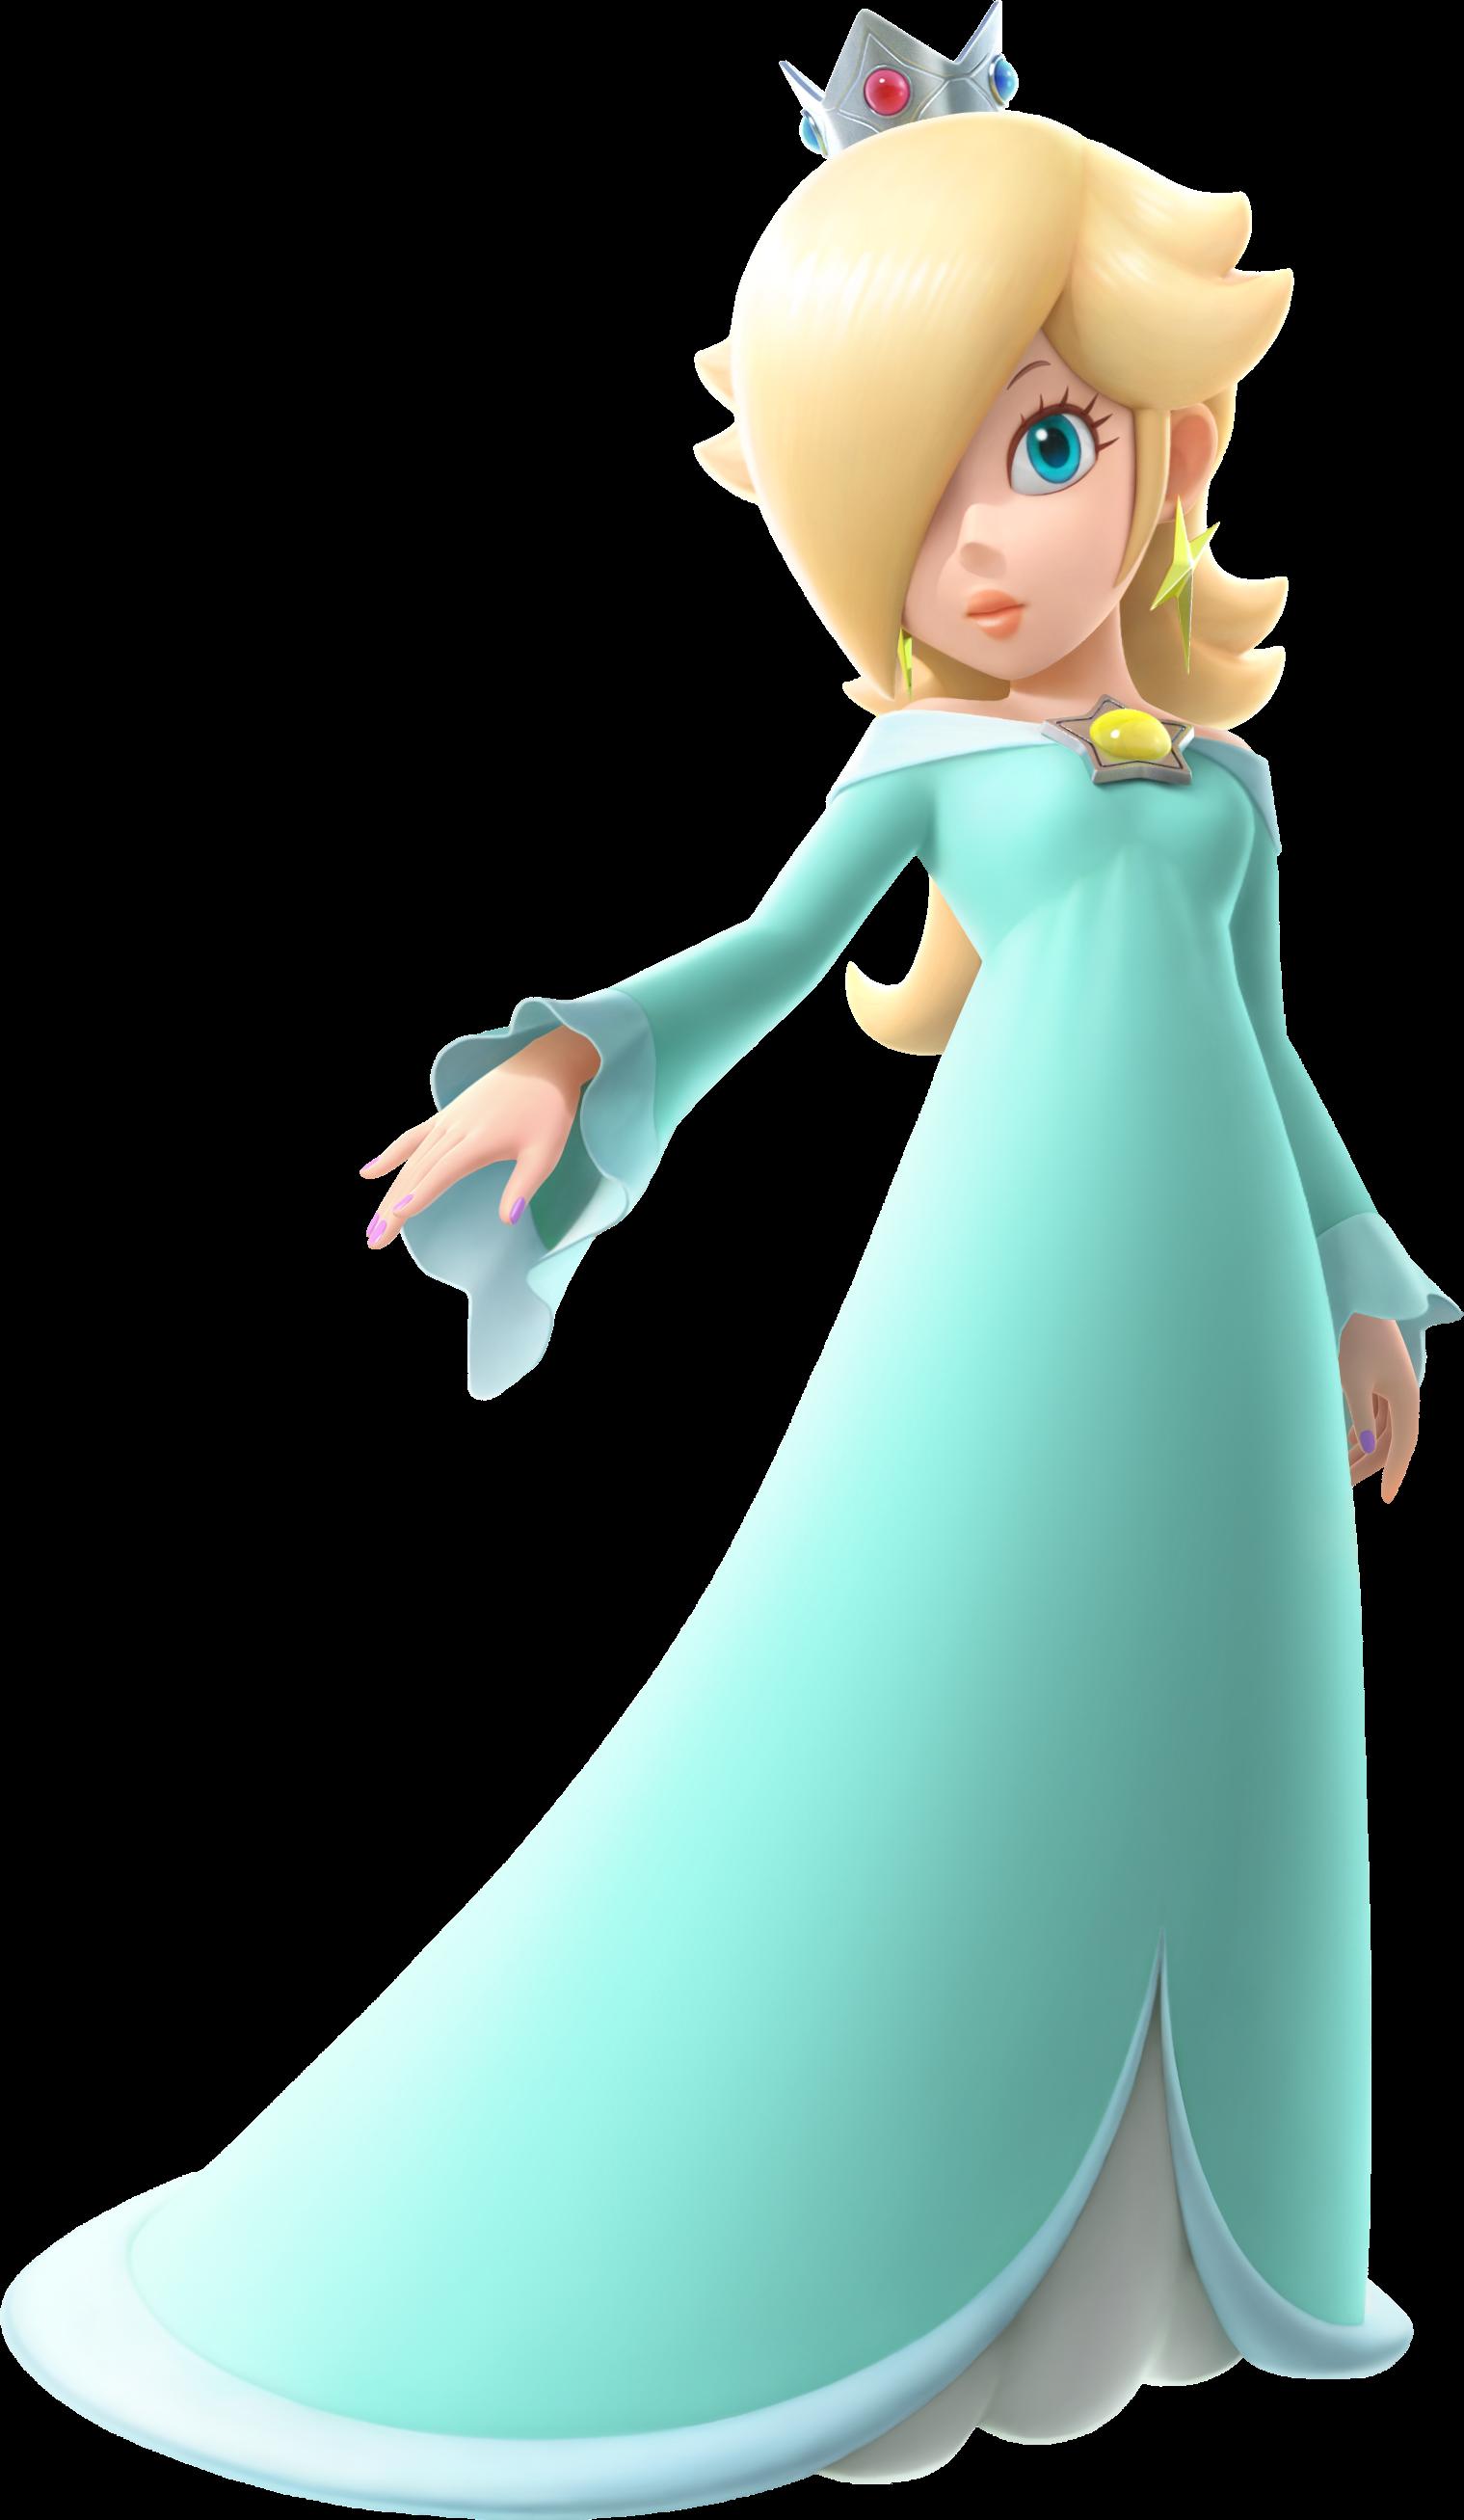 Rosalina Mariowiki Fandom